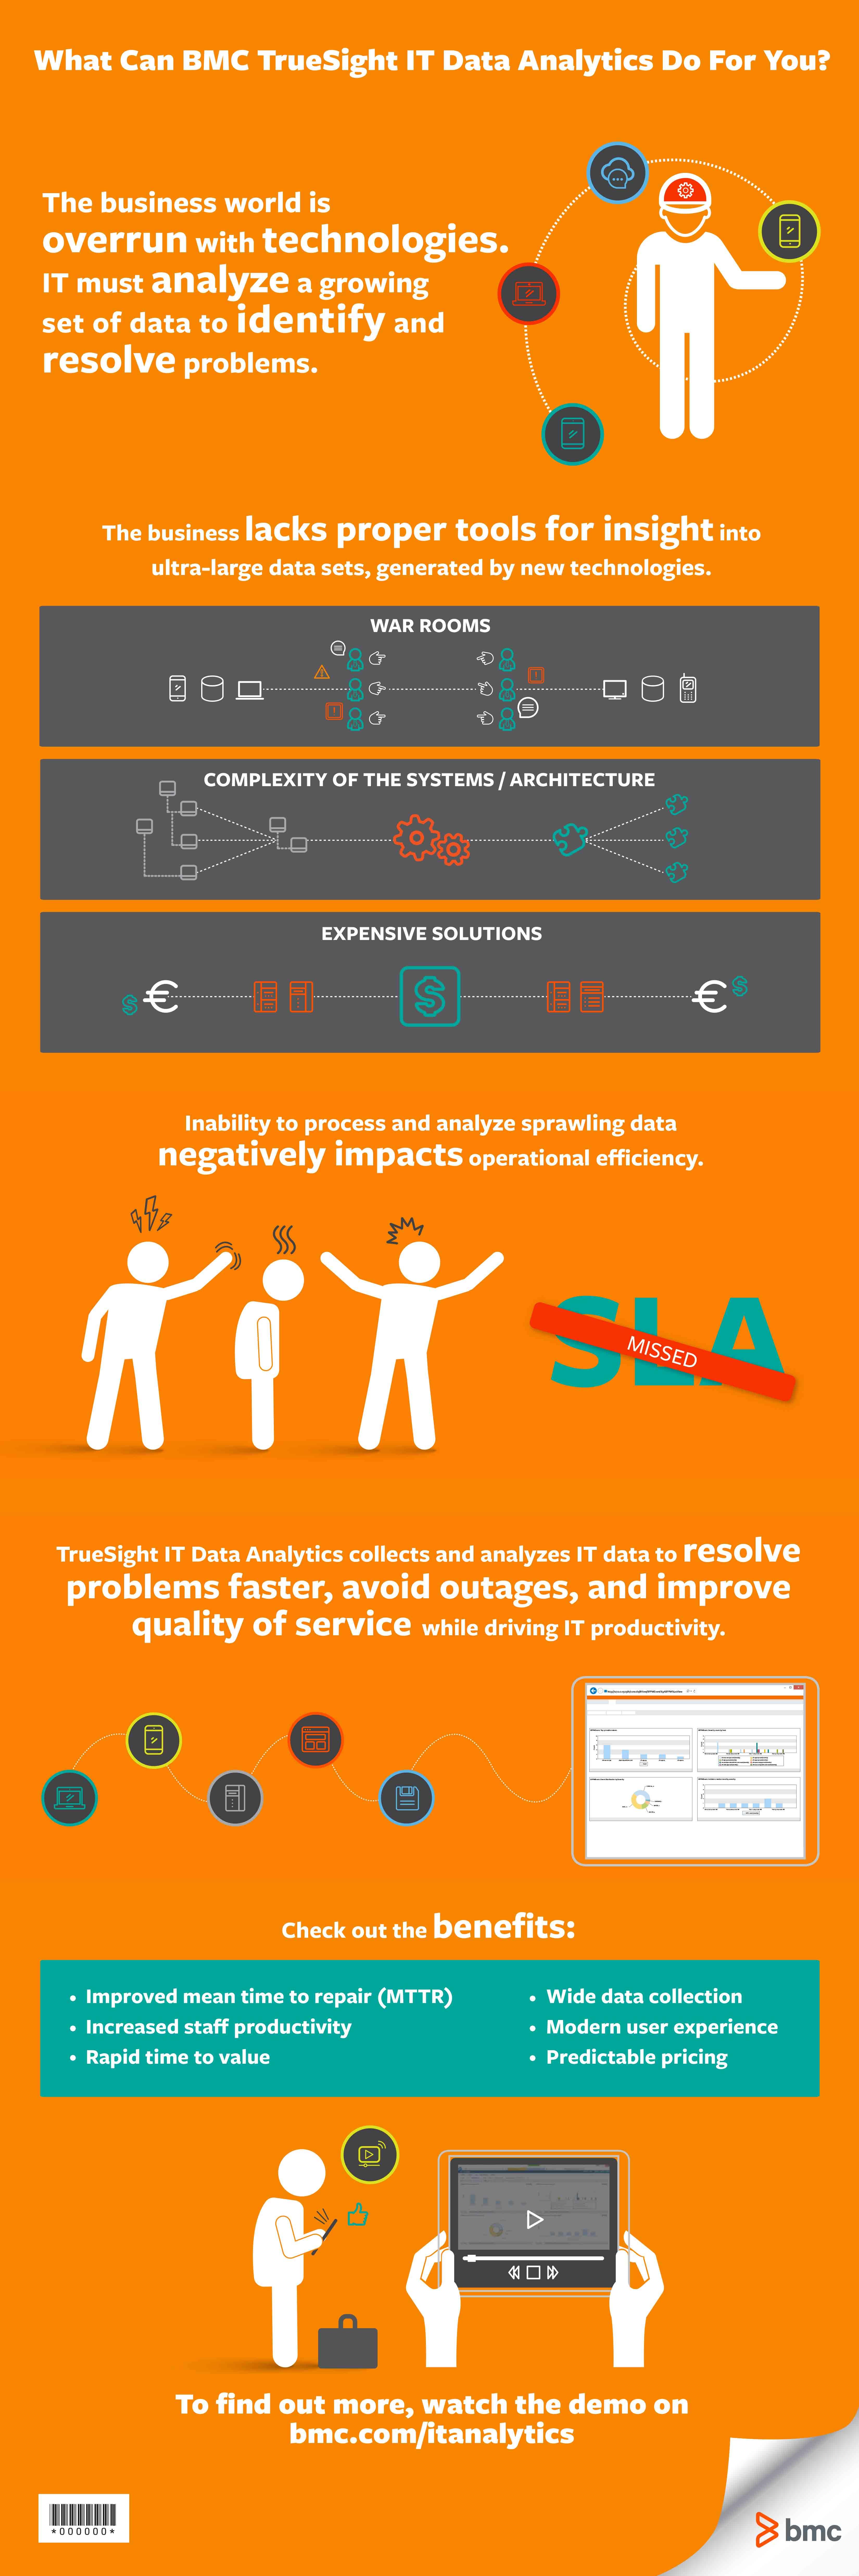 ITDA_infographic_020515